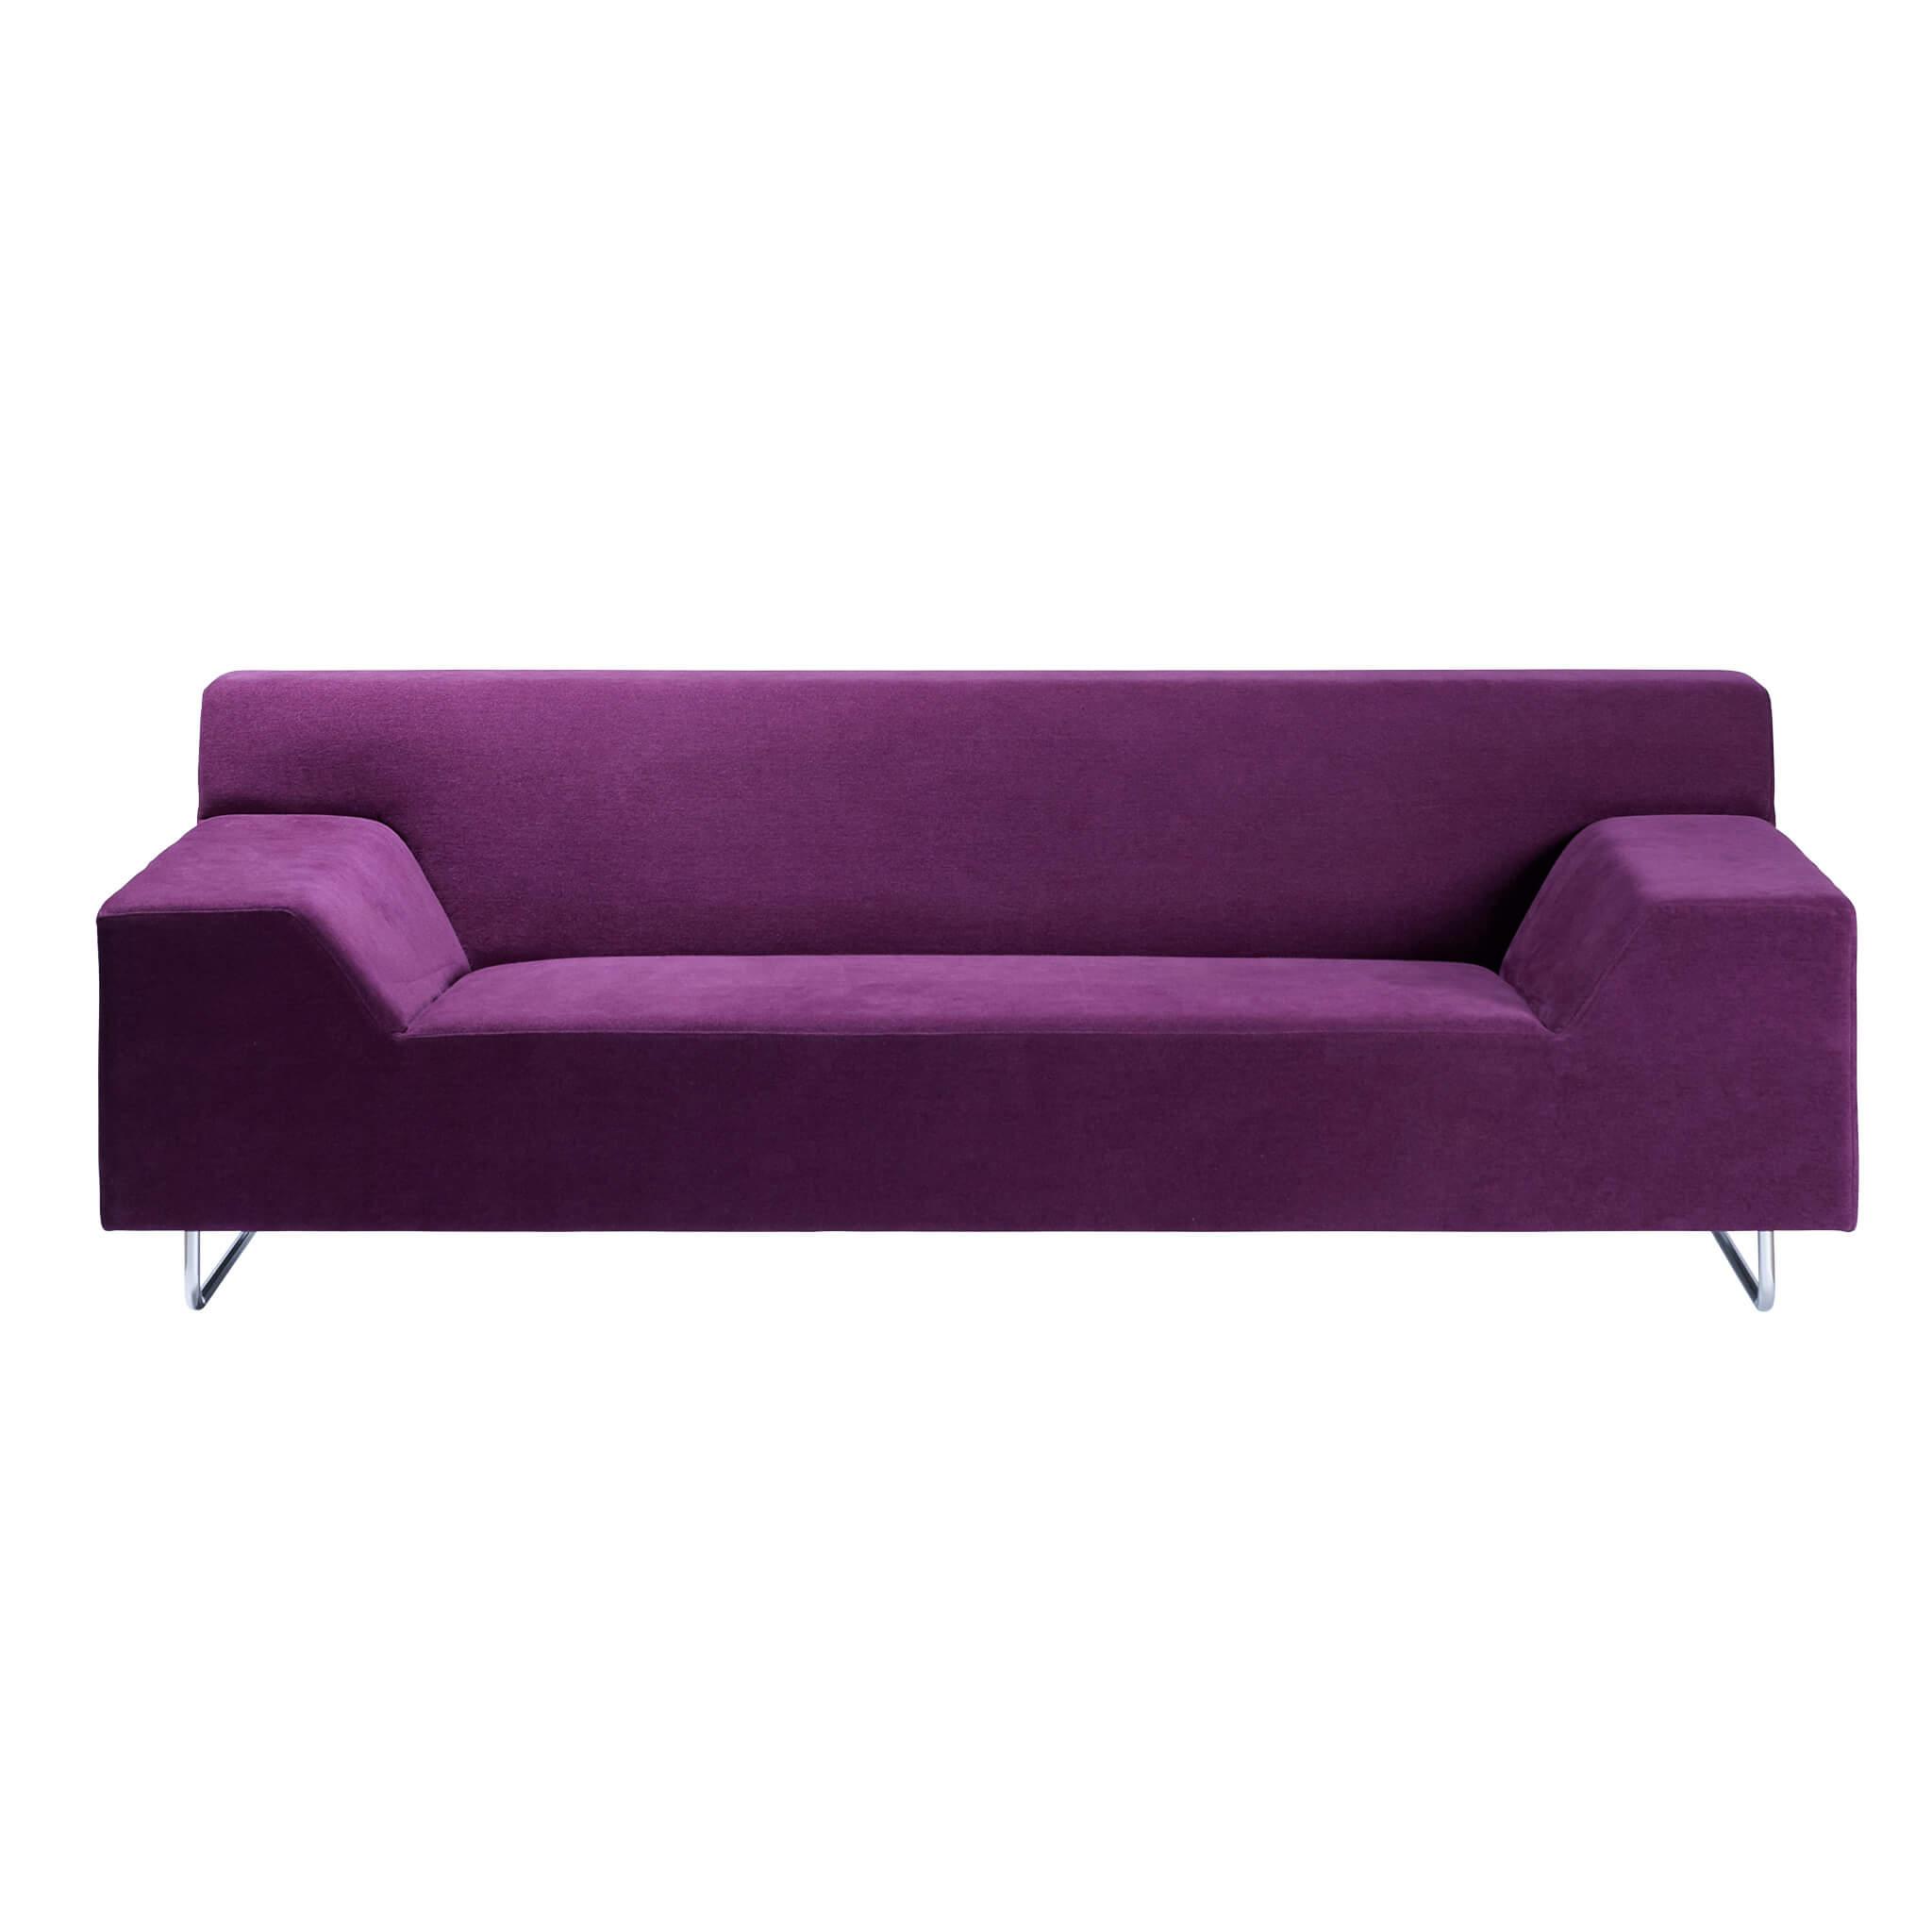 costa sofa 3p fix